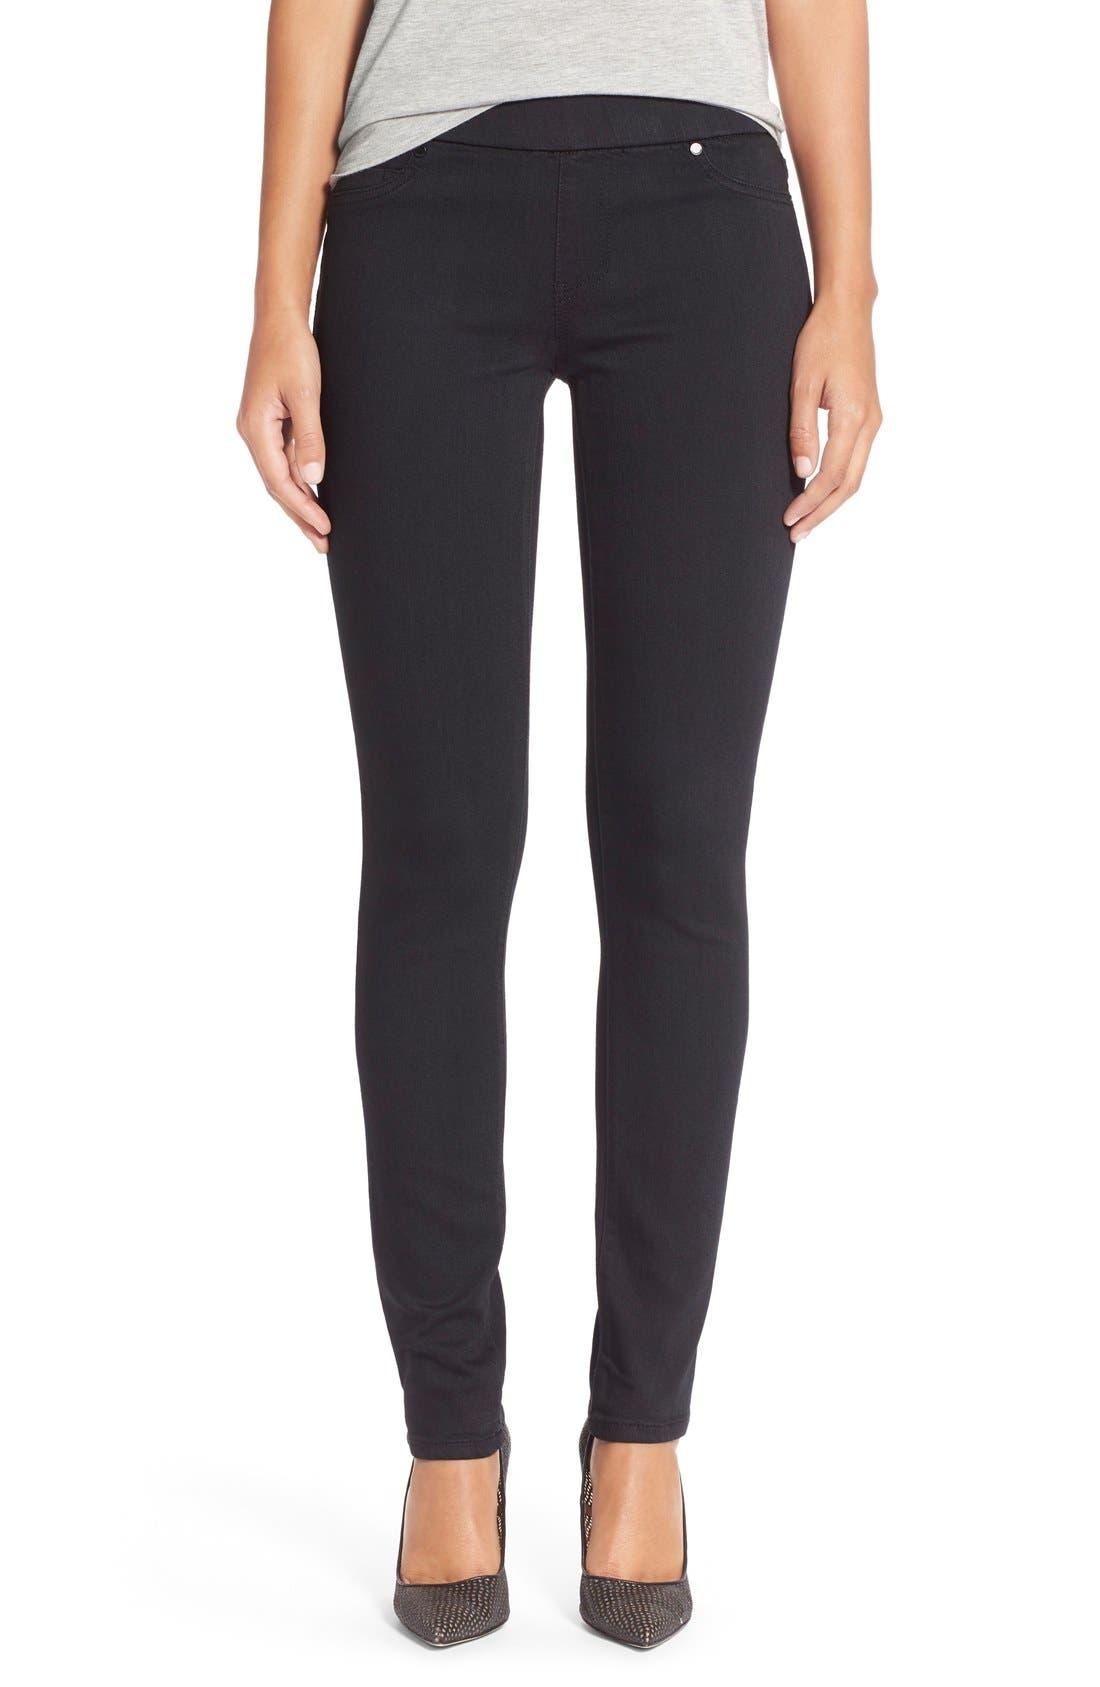 Liverpool Jeans Company 'Sienna' Pull-On Knit Denim Leggings (Petite)